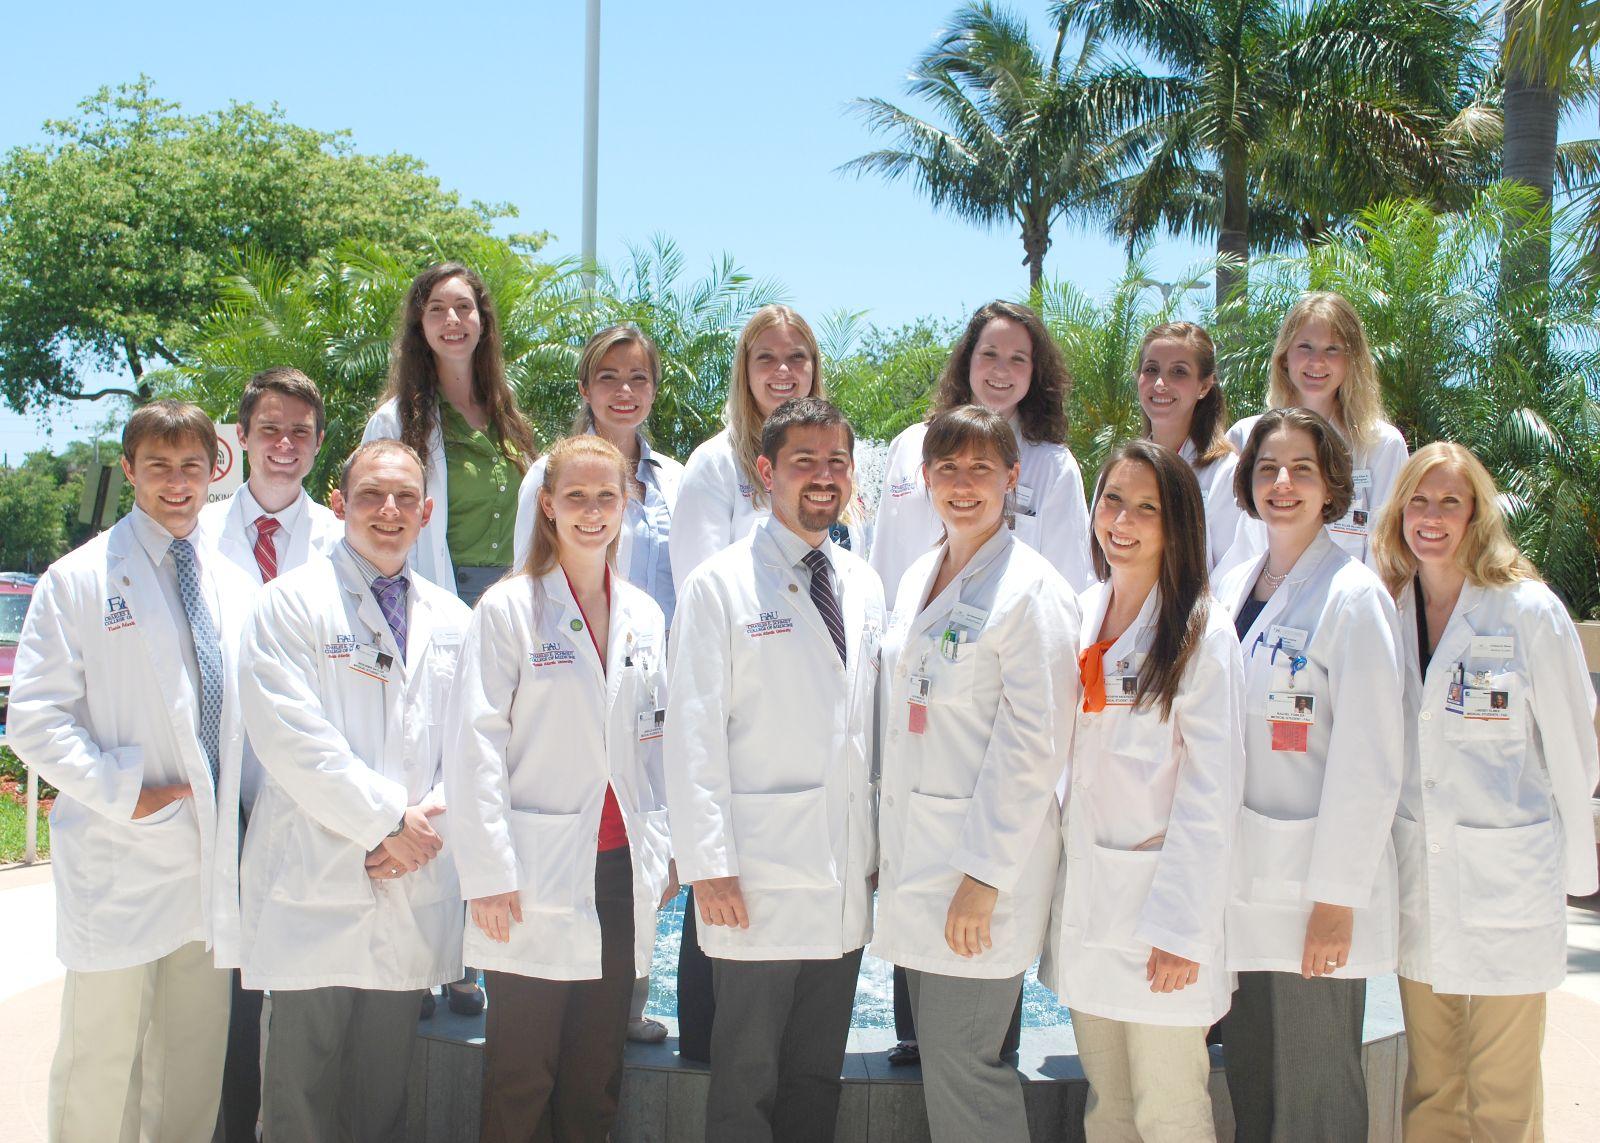 Bethesda Hospital East Boynton Beach Florida